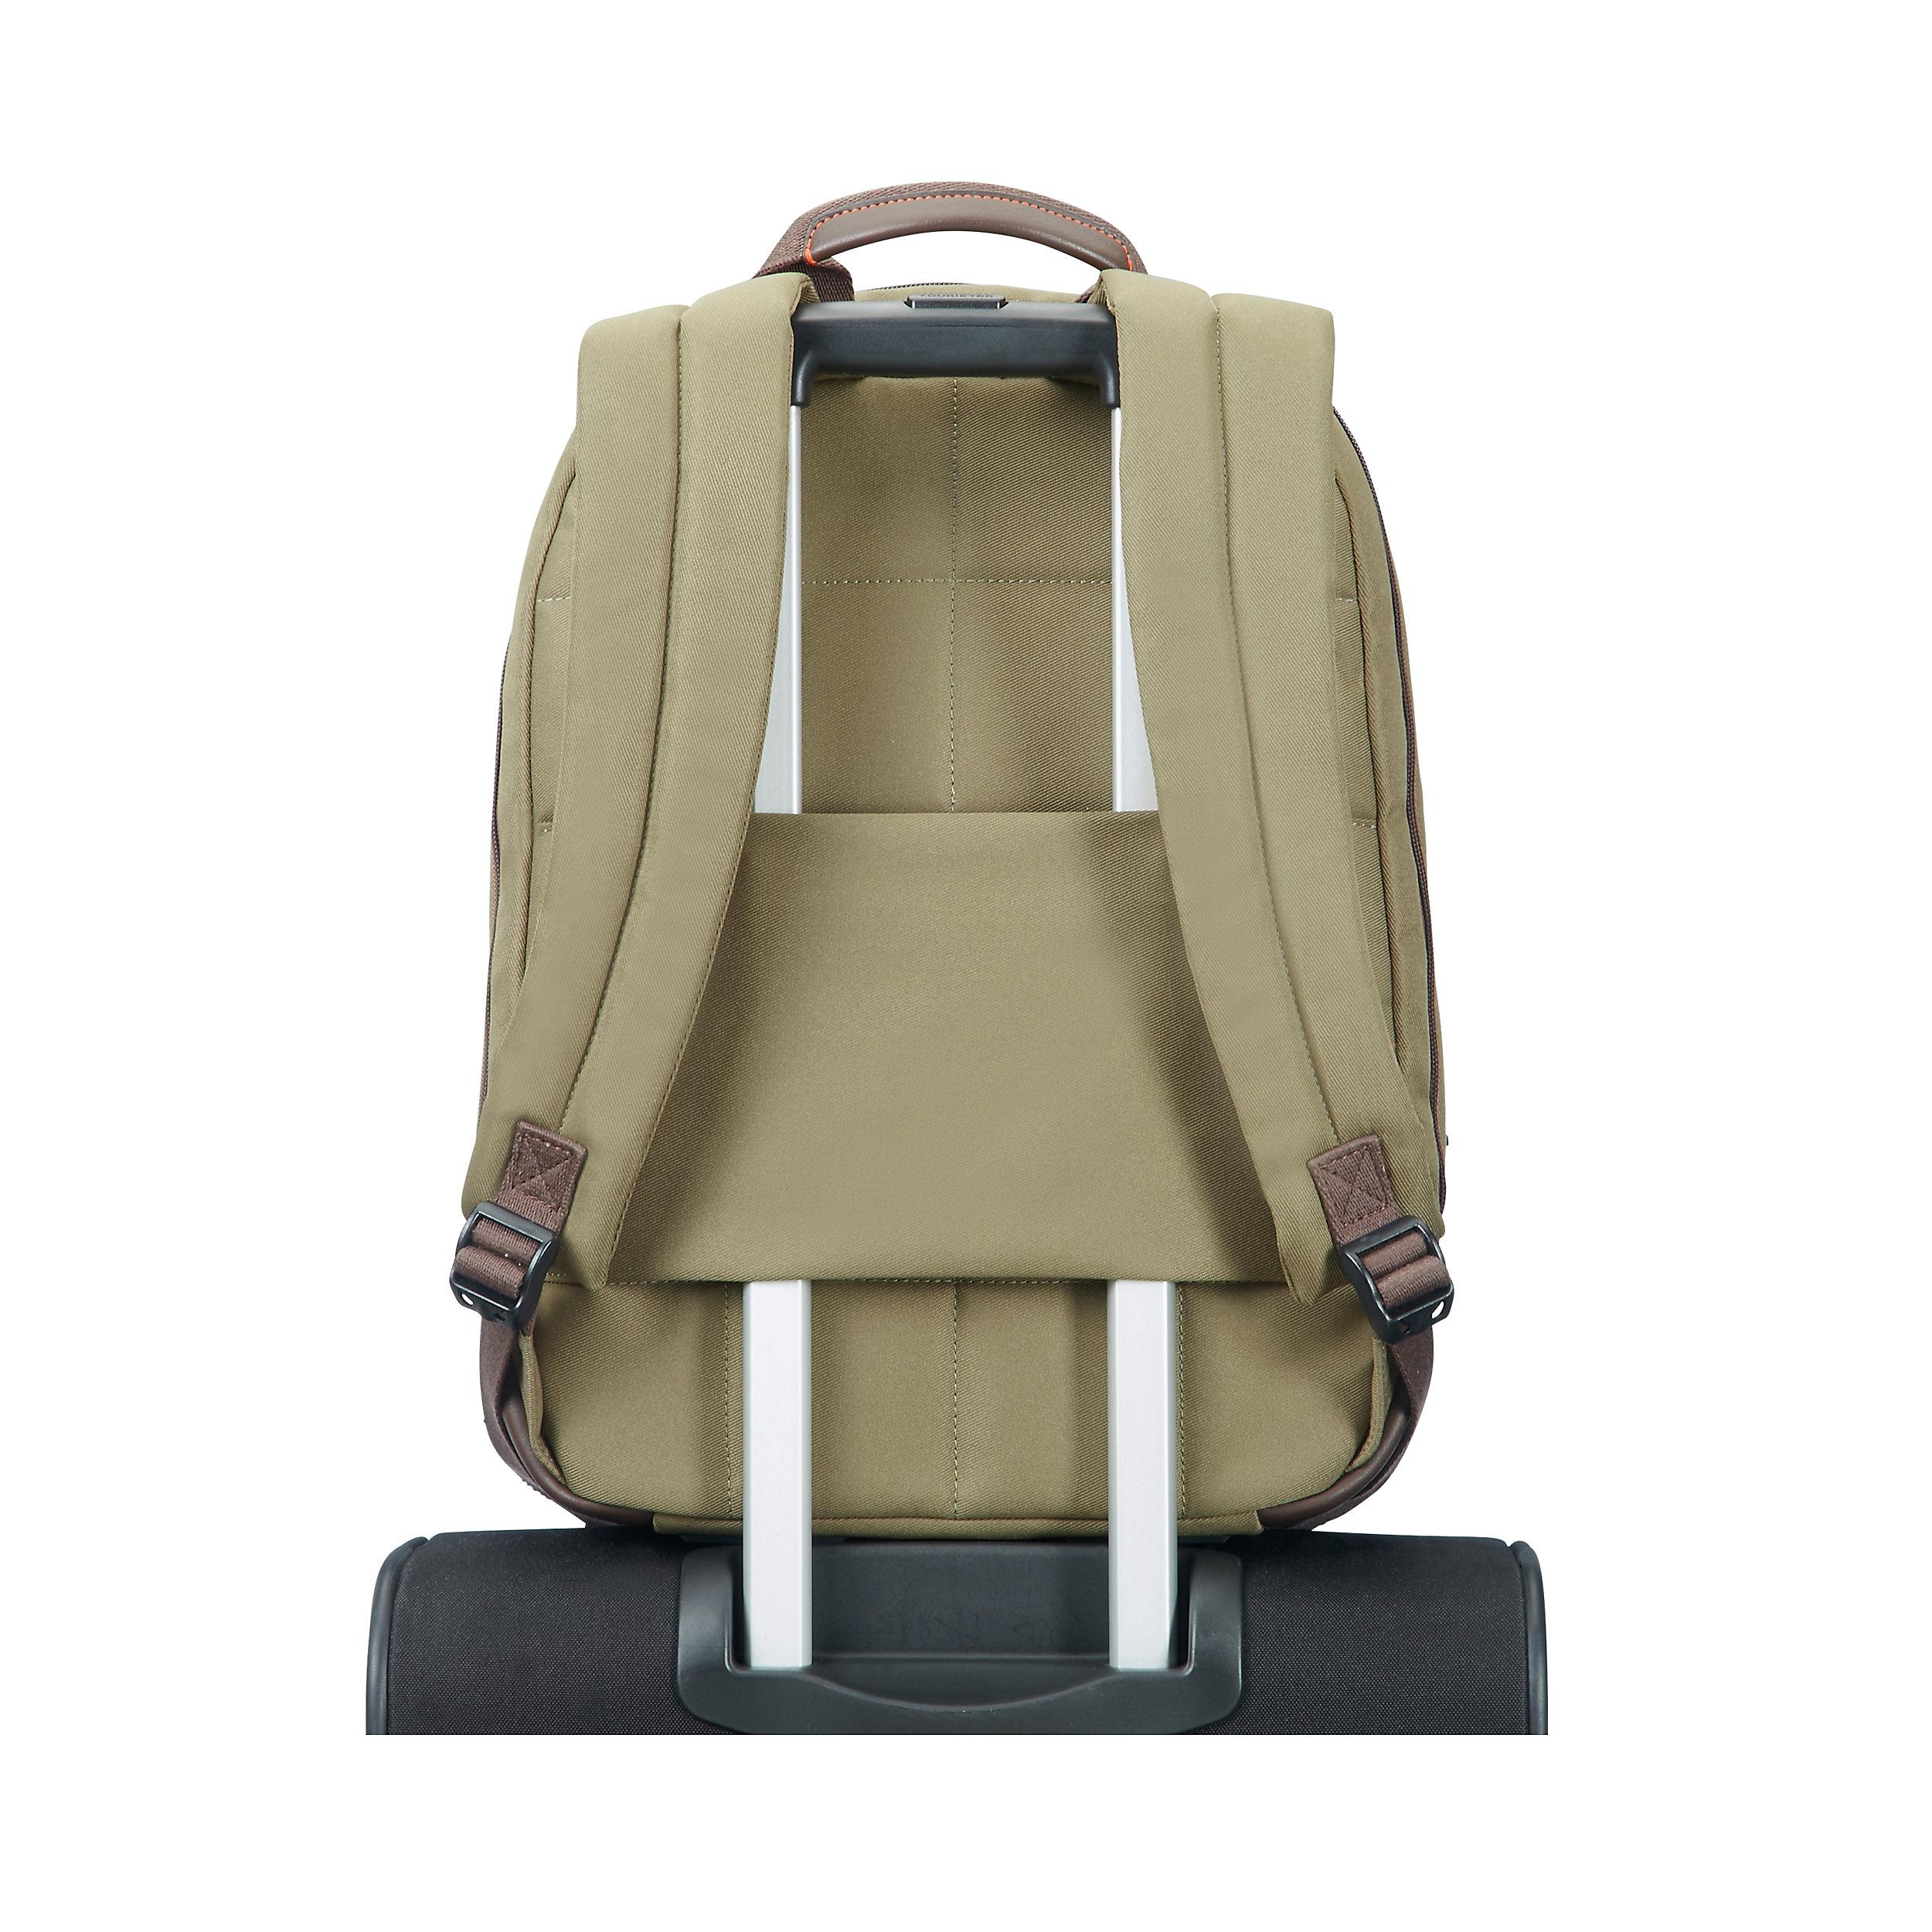 "Laptoprucksack 15,6"" Rockwell M 18.5 Liter"